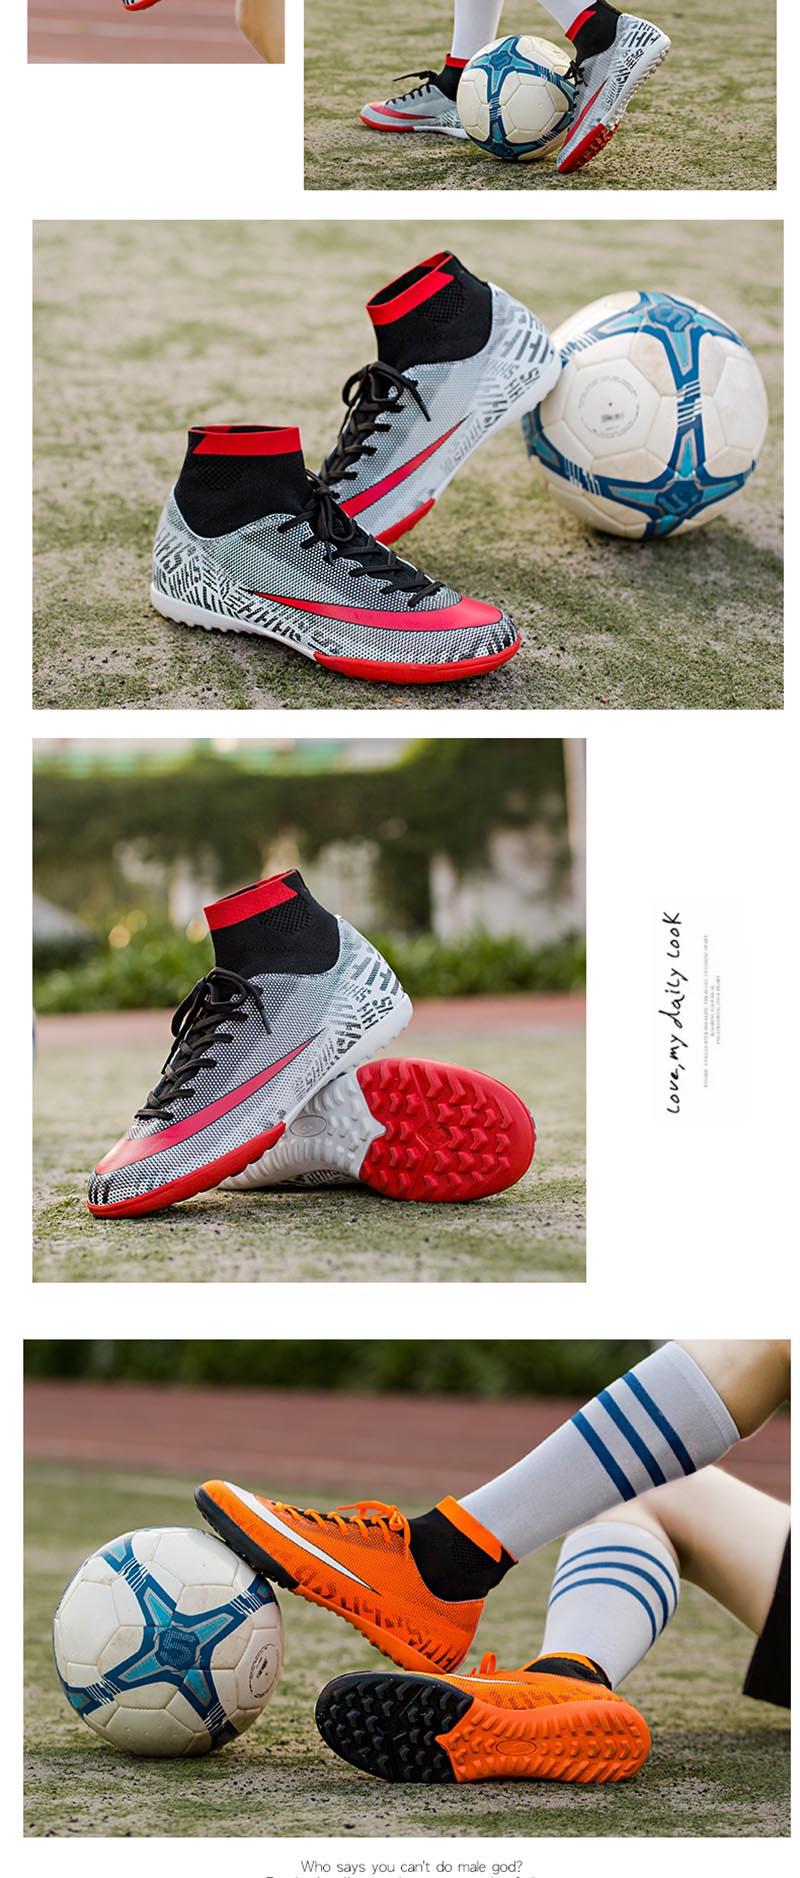 botas de futebol alta profissional superfly futebol